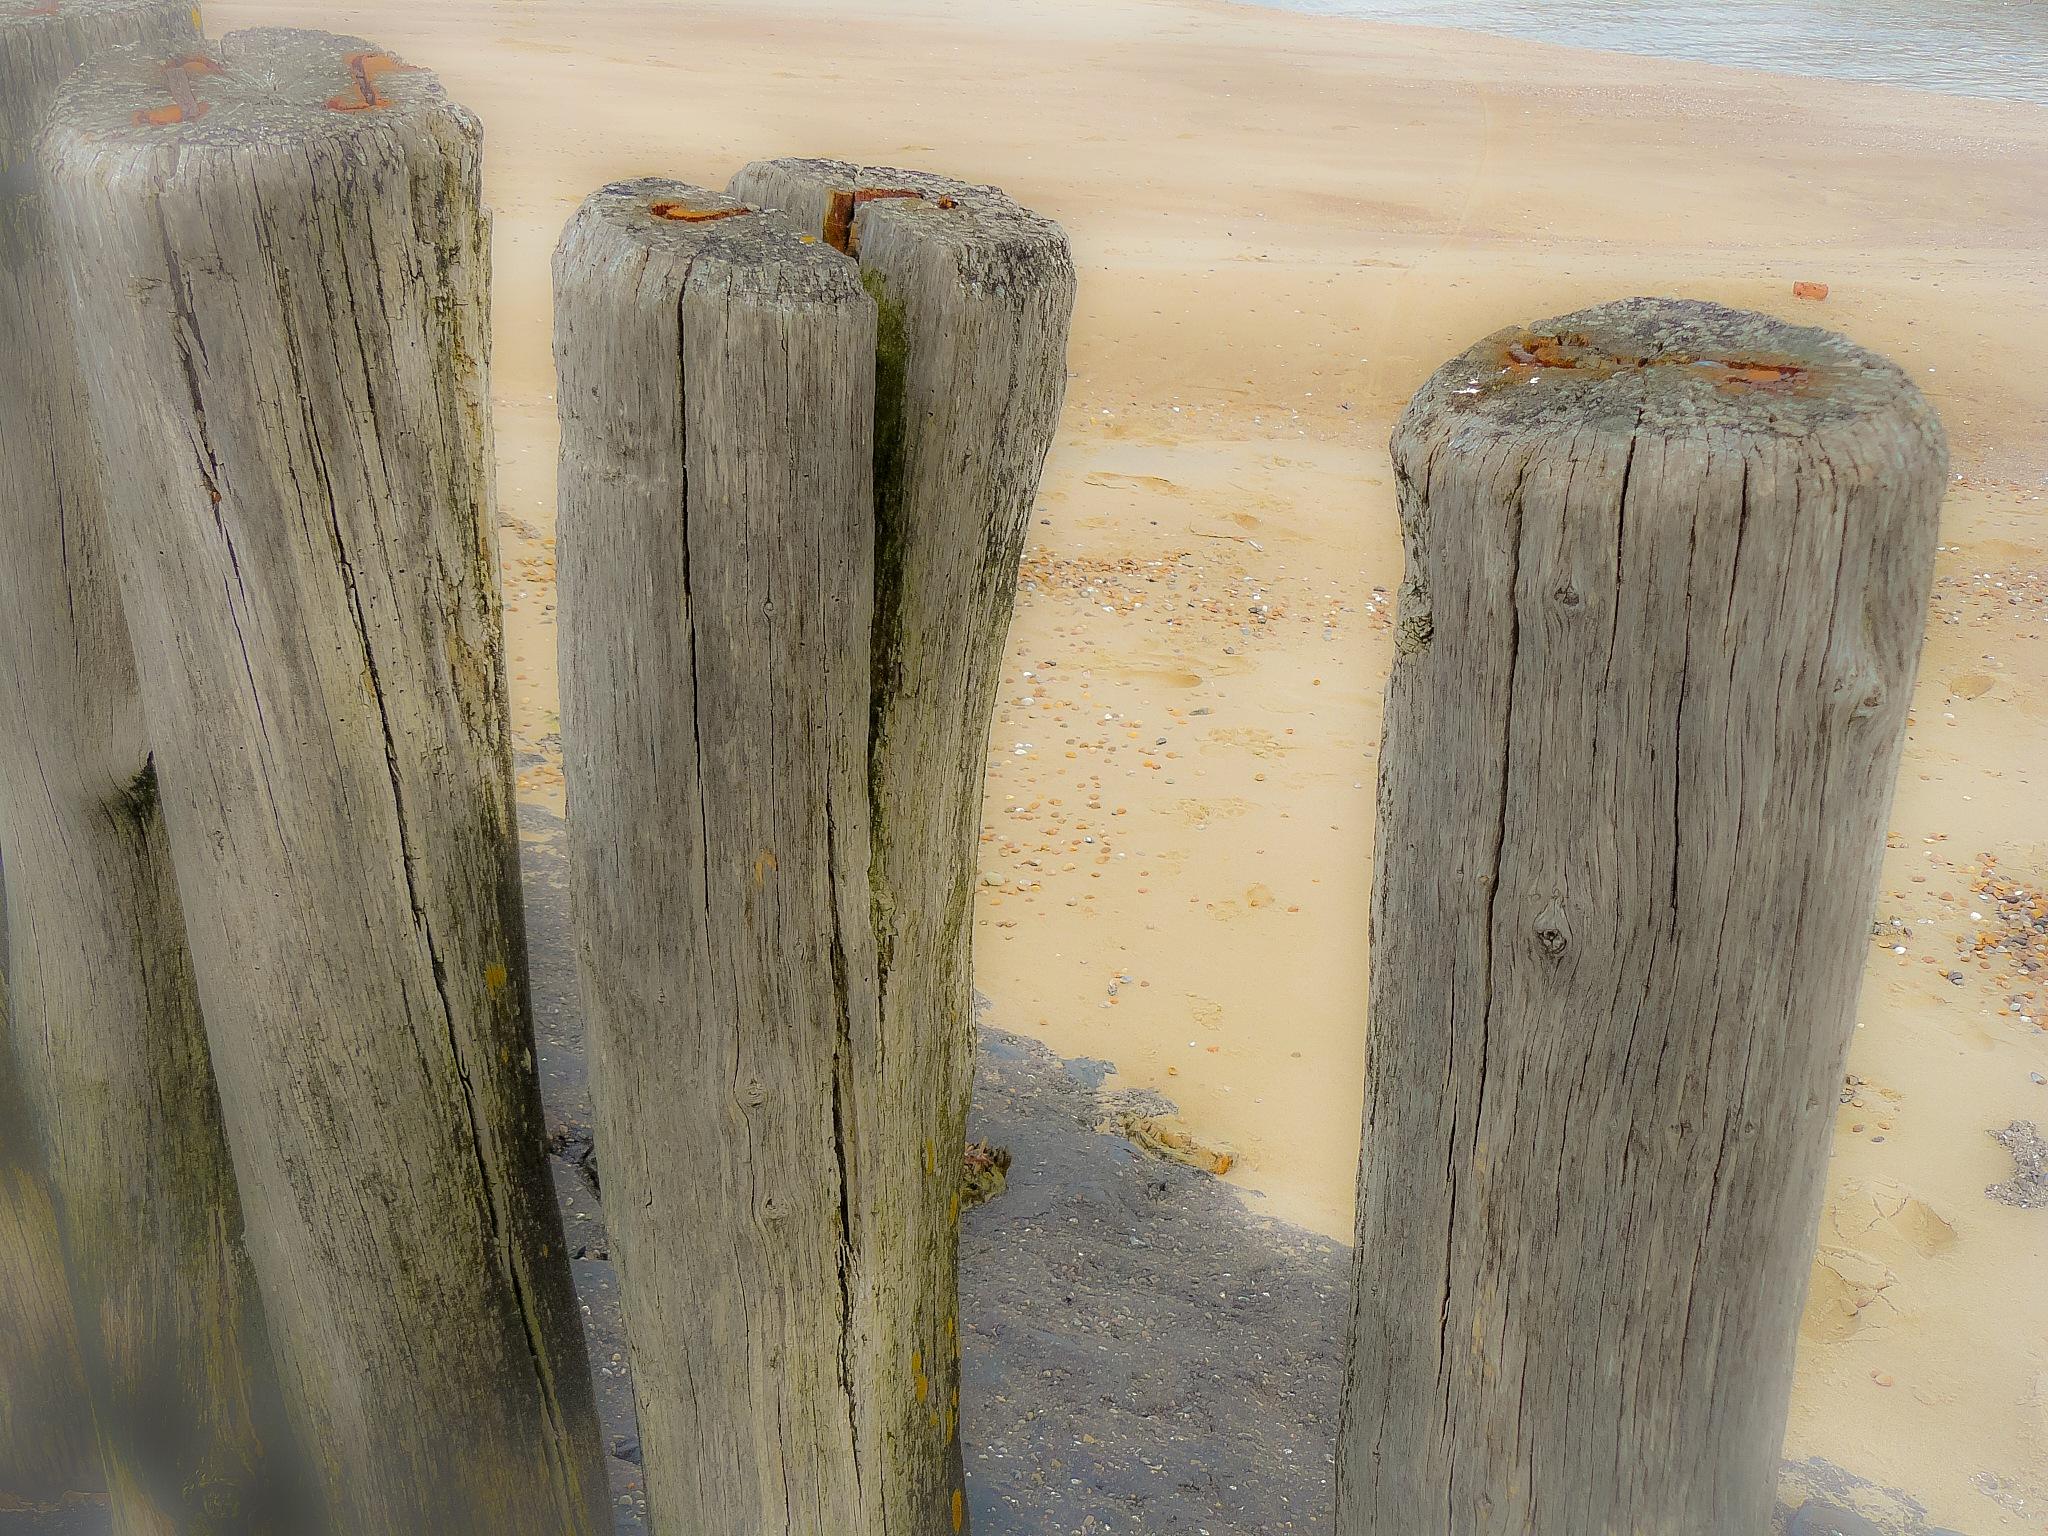 beach by Paul Geutjes